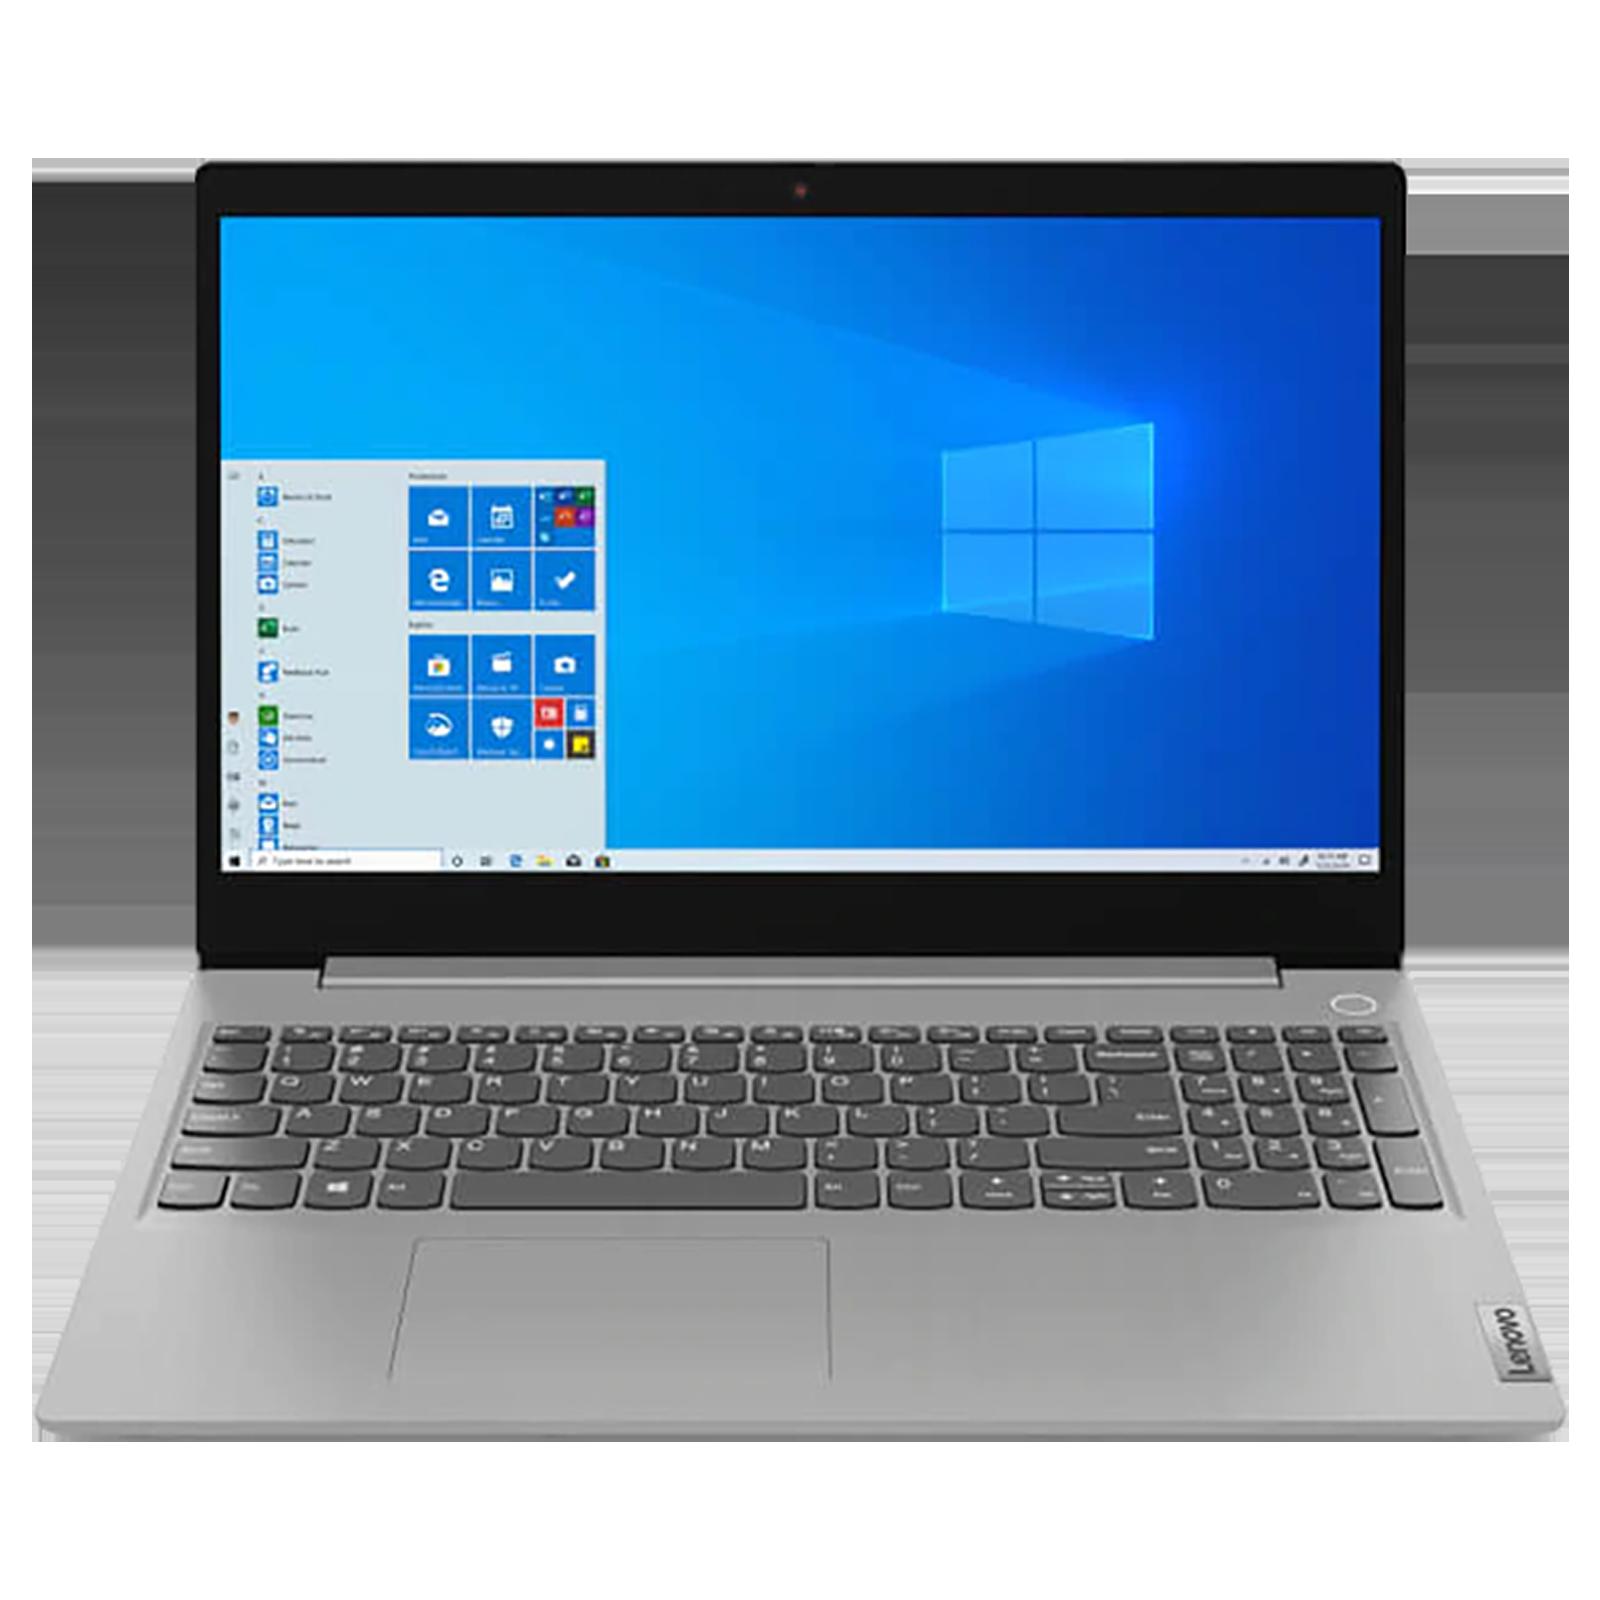 Lenovo IdeaPad 3 15IGL05 (81WQ008QIN) Celeron Windows 10 Home Thin and Light Laptop (4GB RAM, 256GB SSD, Intel UHD Graphics 600, MS Office, 39.62cm, Platinum Grey)_1